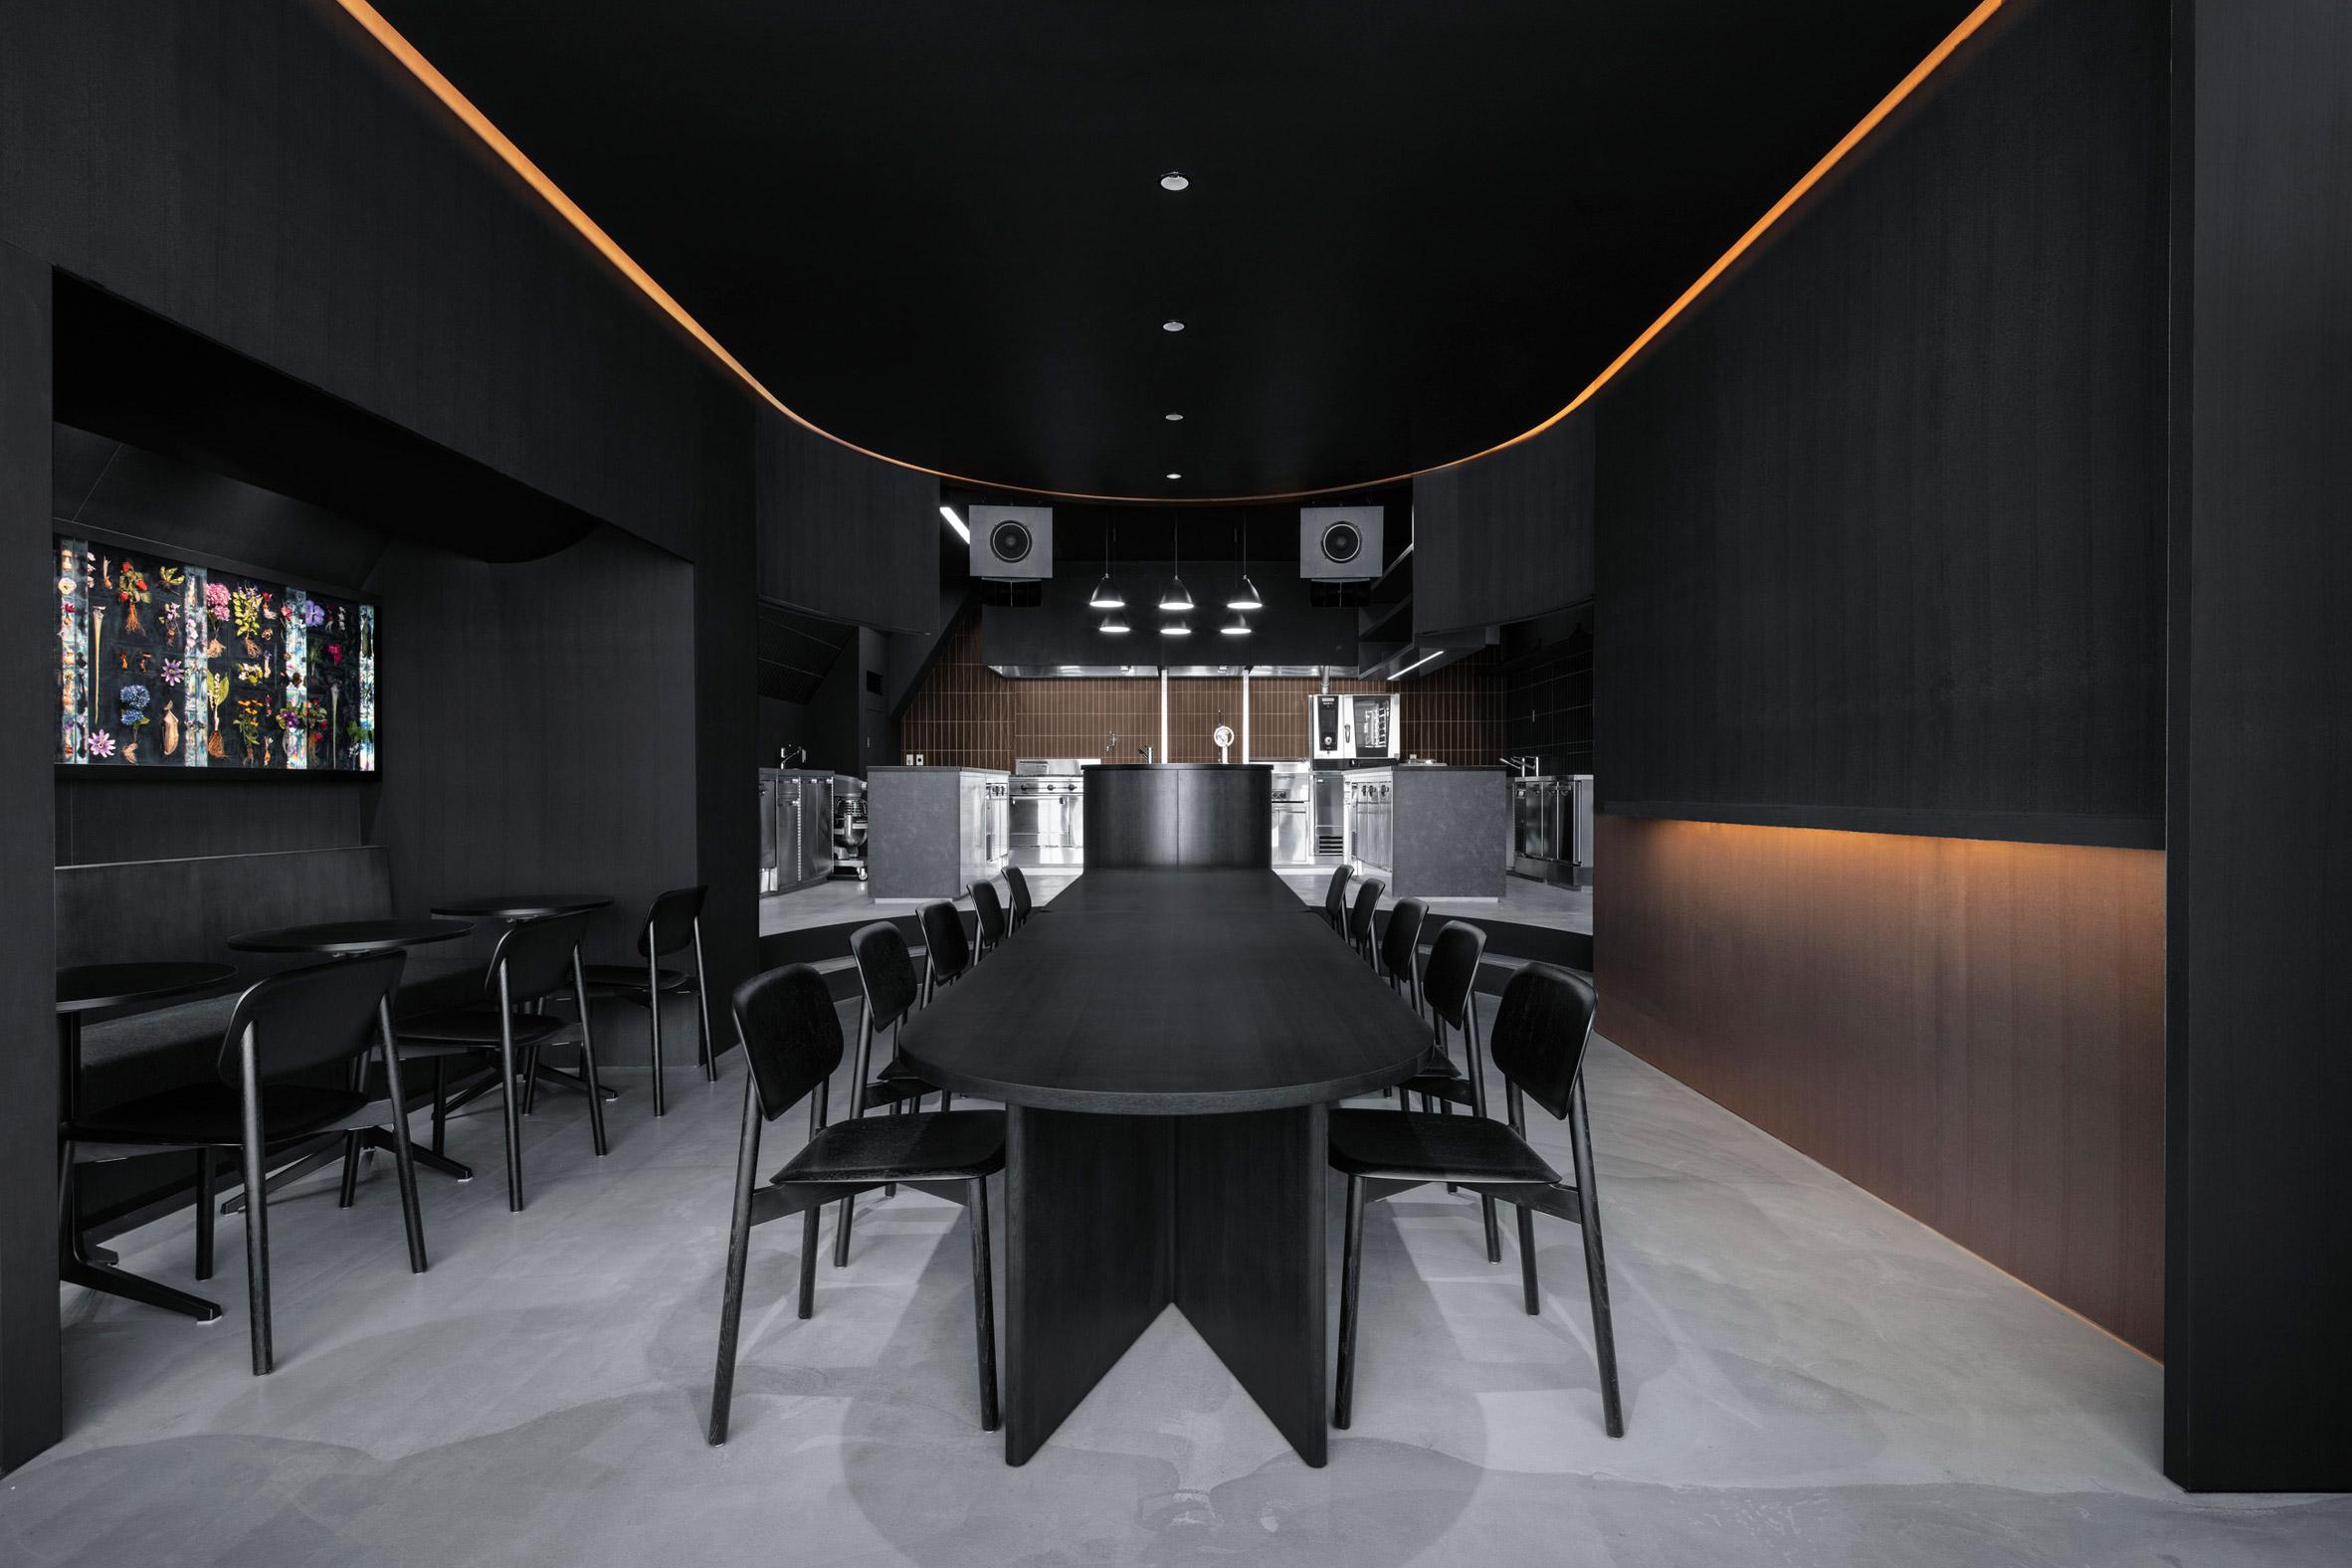 Dining area of of Tokyo restaurant by Snøhetta